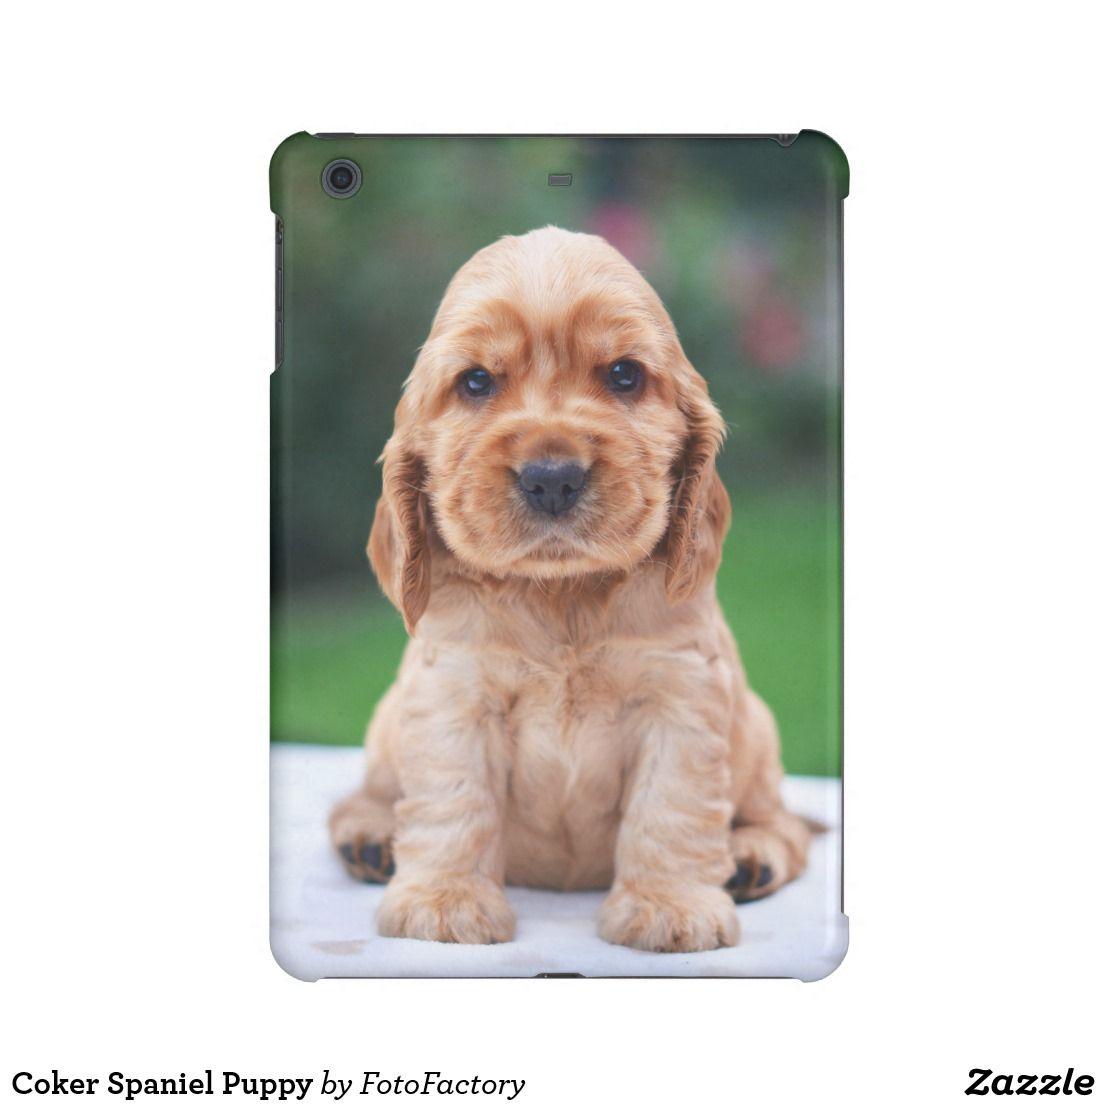 Coker Spaniel Puppy Ipad Mini Cover Zazzle Com Spaniel Puppies Puppies Cat Illnesses